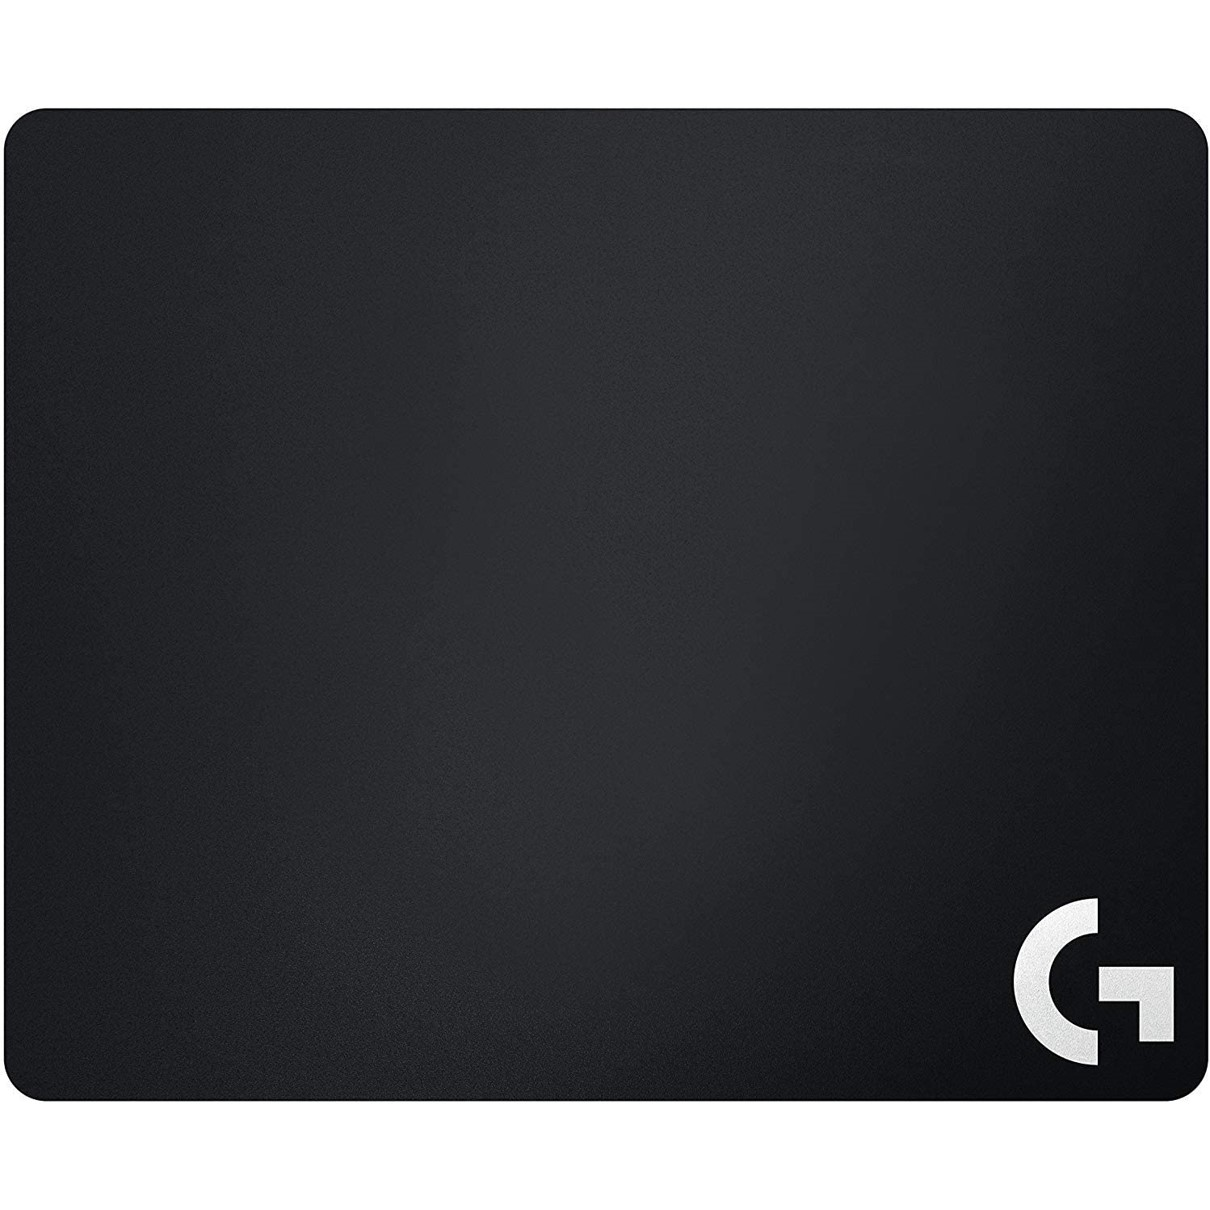 Logitech G240 - alfombrilla de ratón